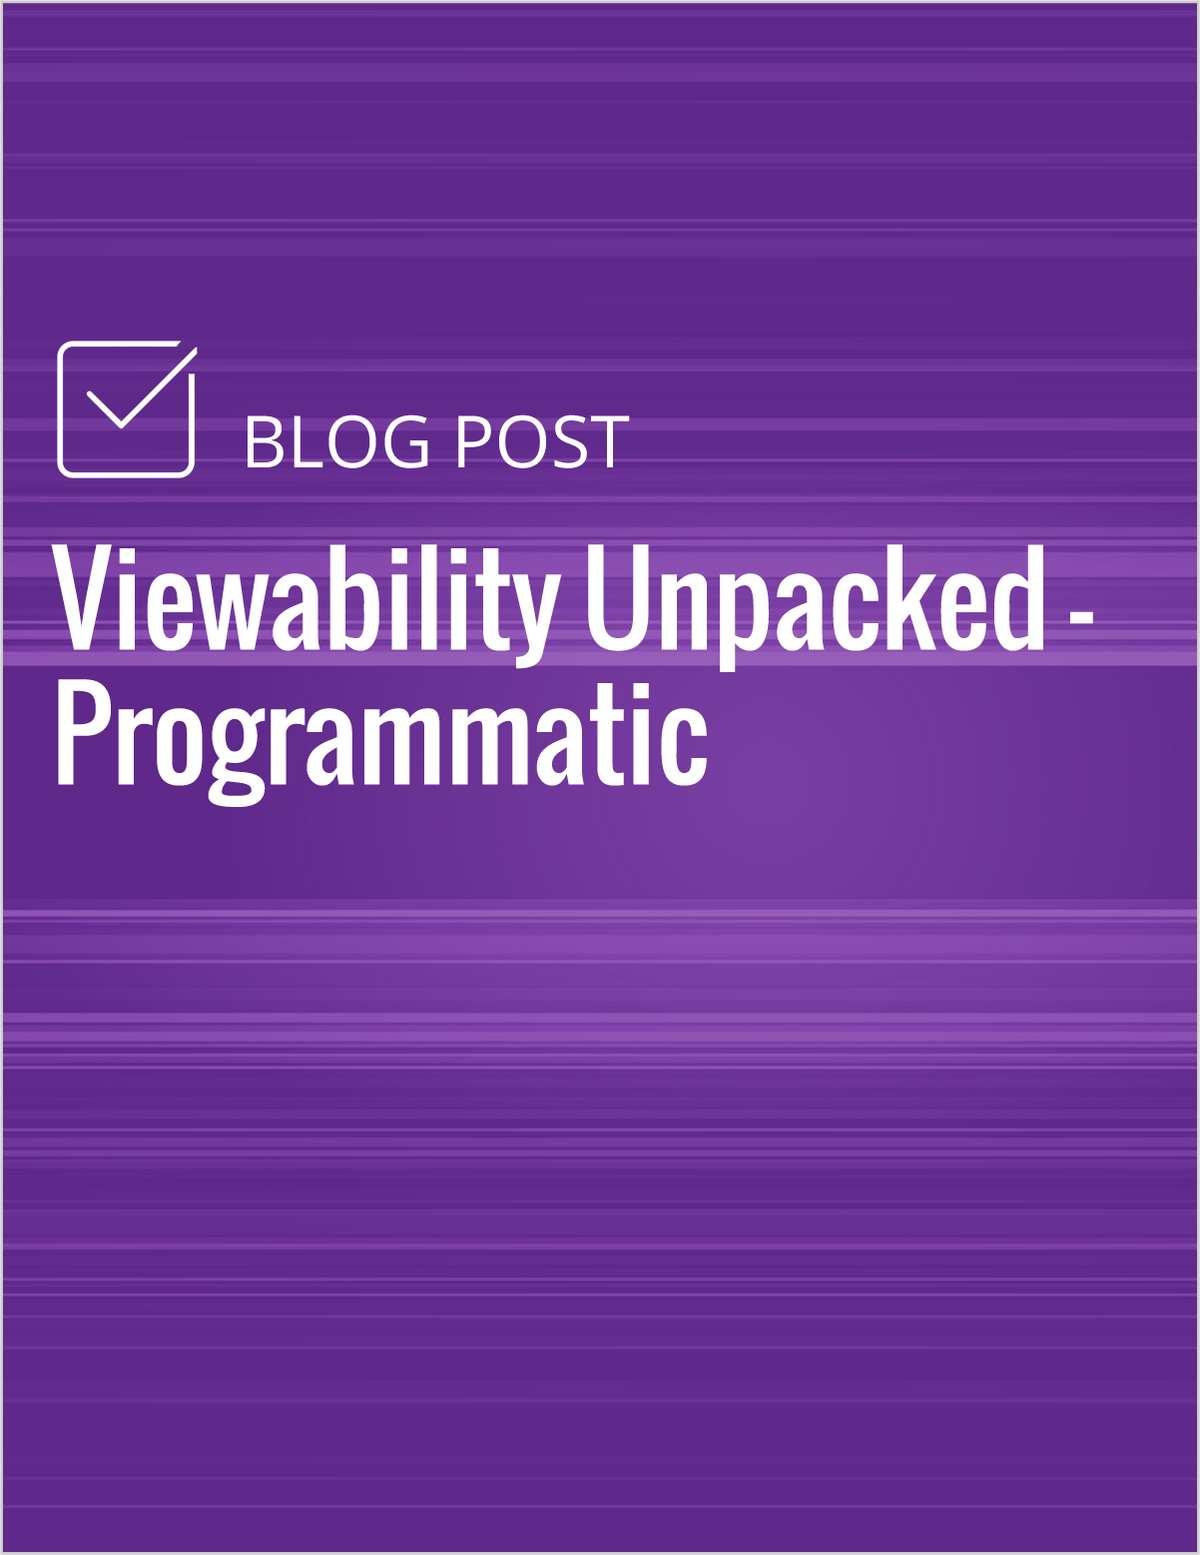 Viewability Unpacked - Programmatic